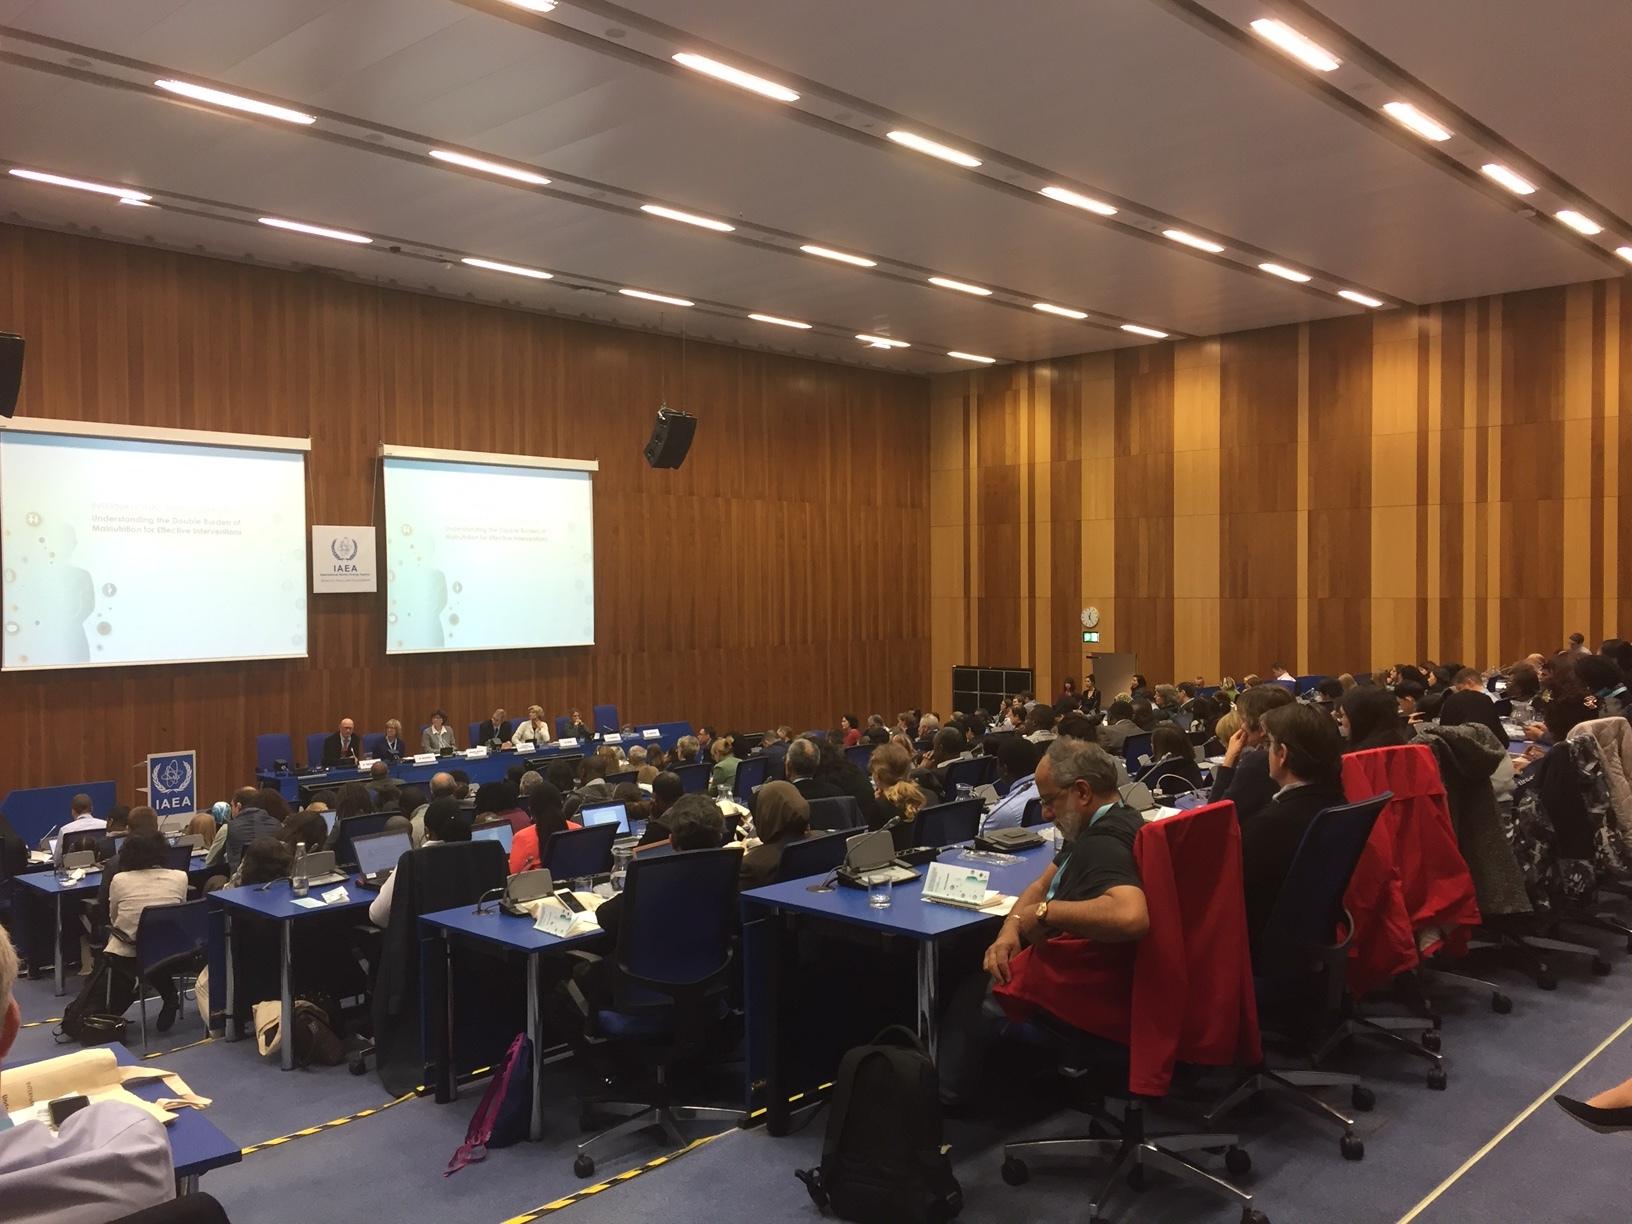 Body Surface Translations at IAEA